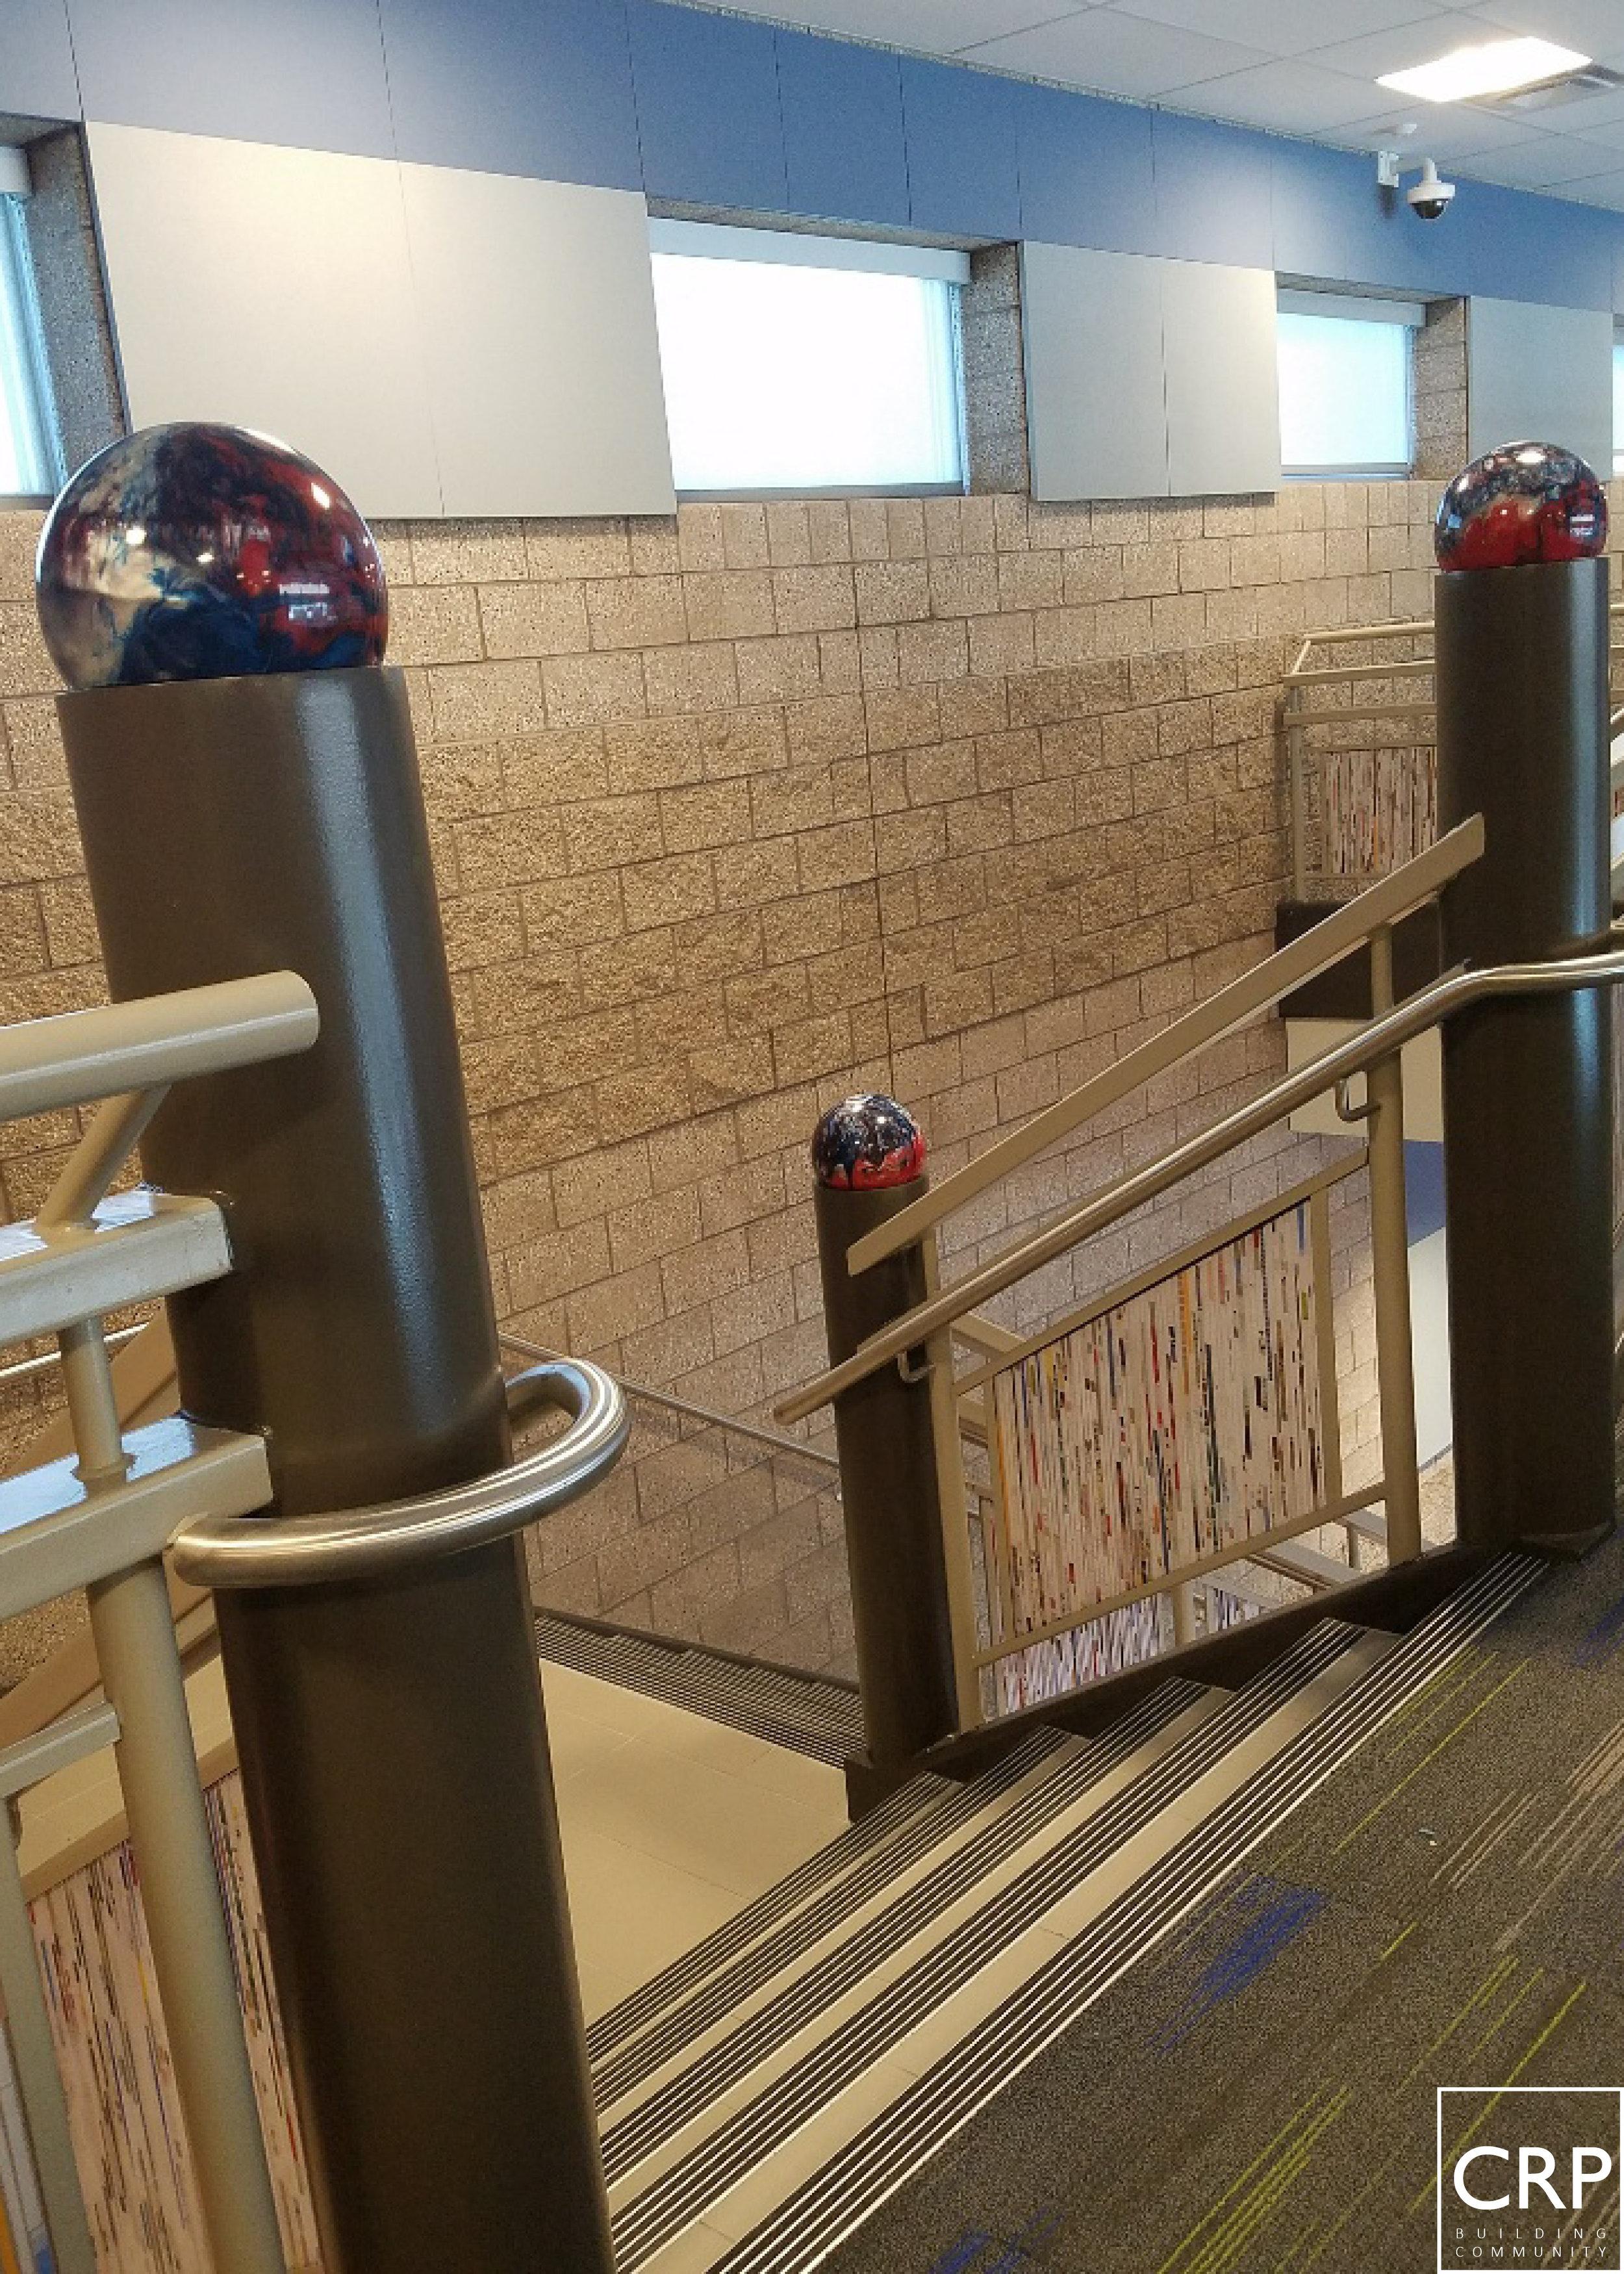 CRP Bowling Stair 2.jpg